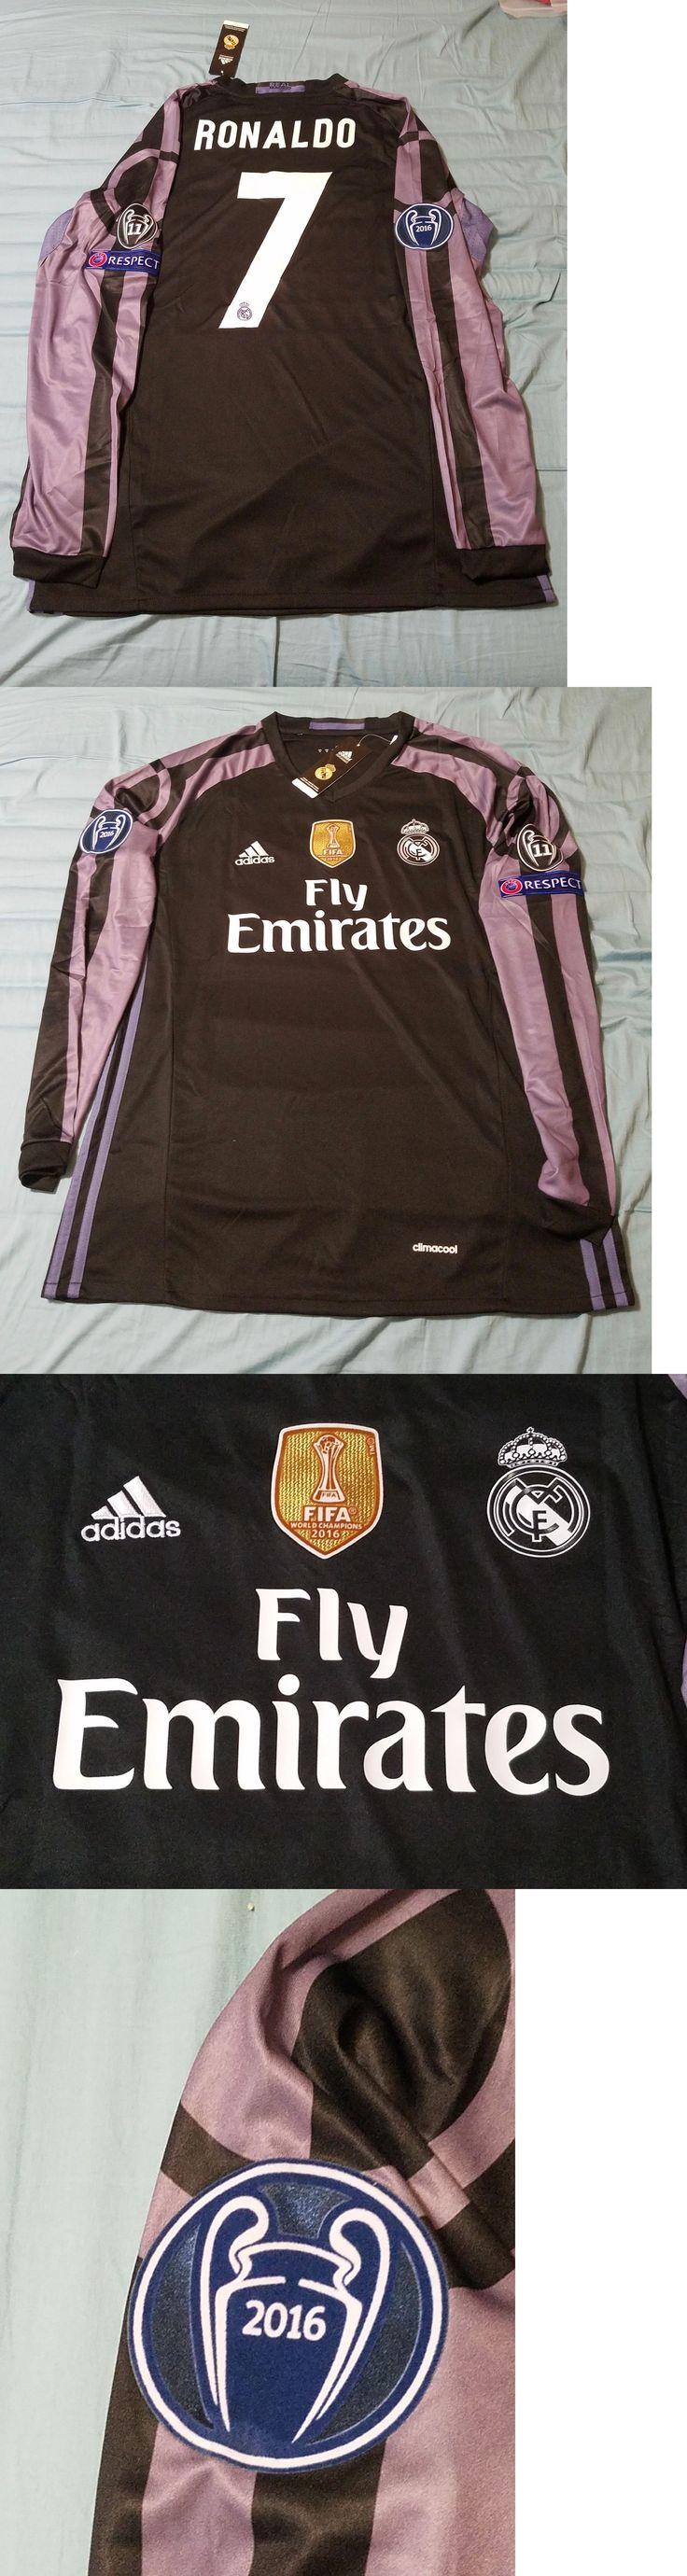 9edc92903 ... Soccer-International Clubs 2887 Cristiano Ronaldo 7 Real Madrid 16 17  Third Long Sleeve Jersey ...